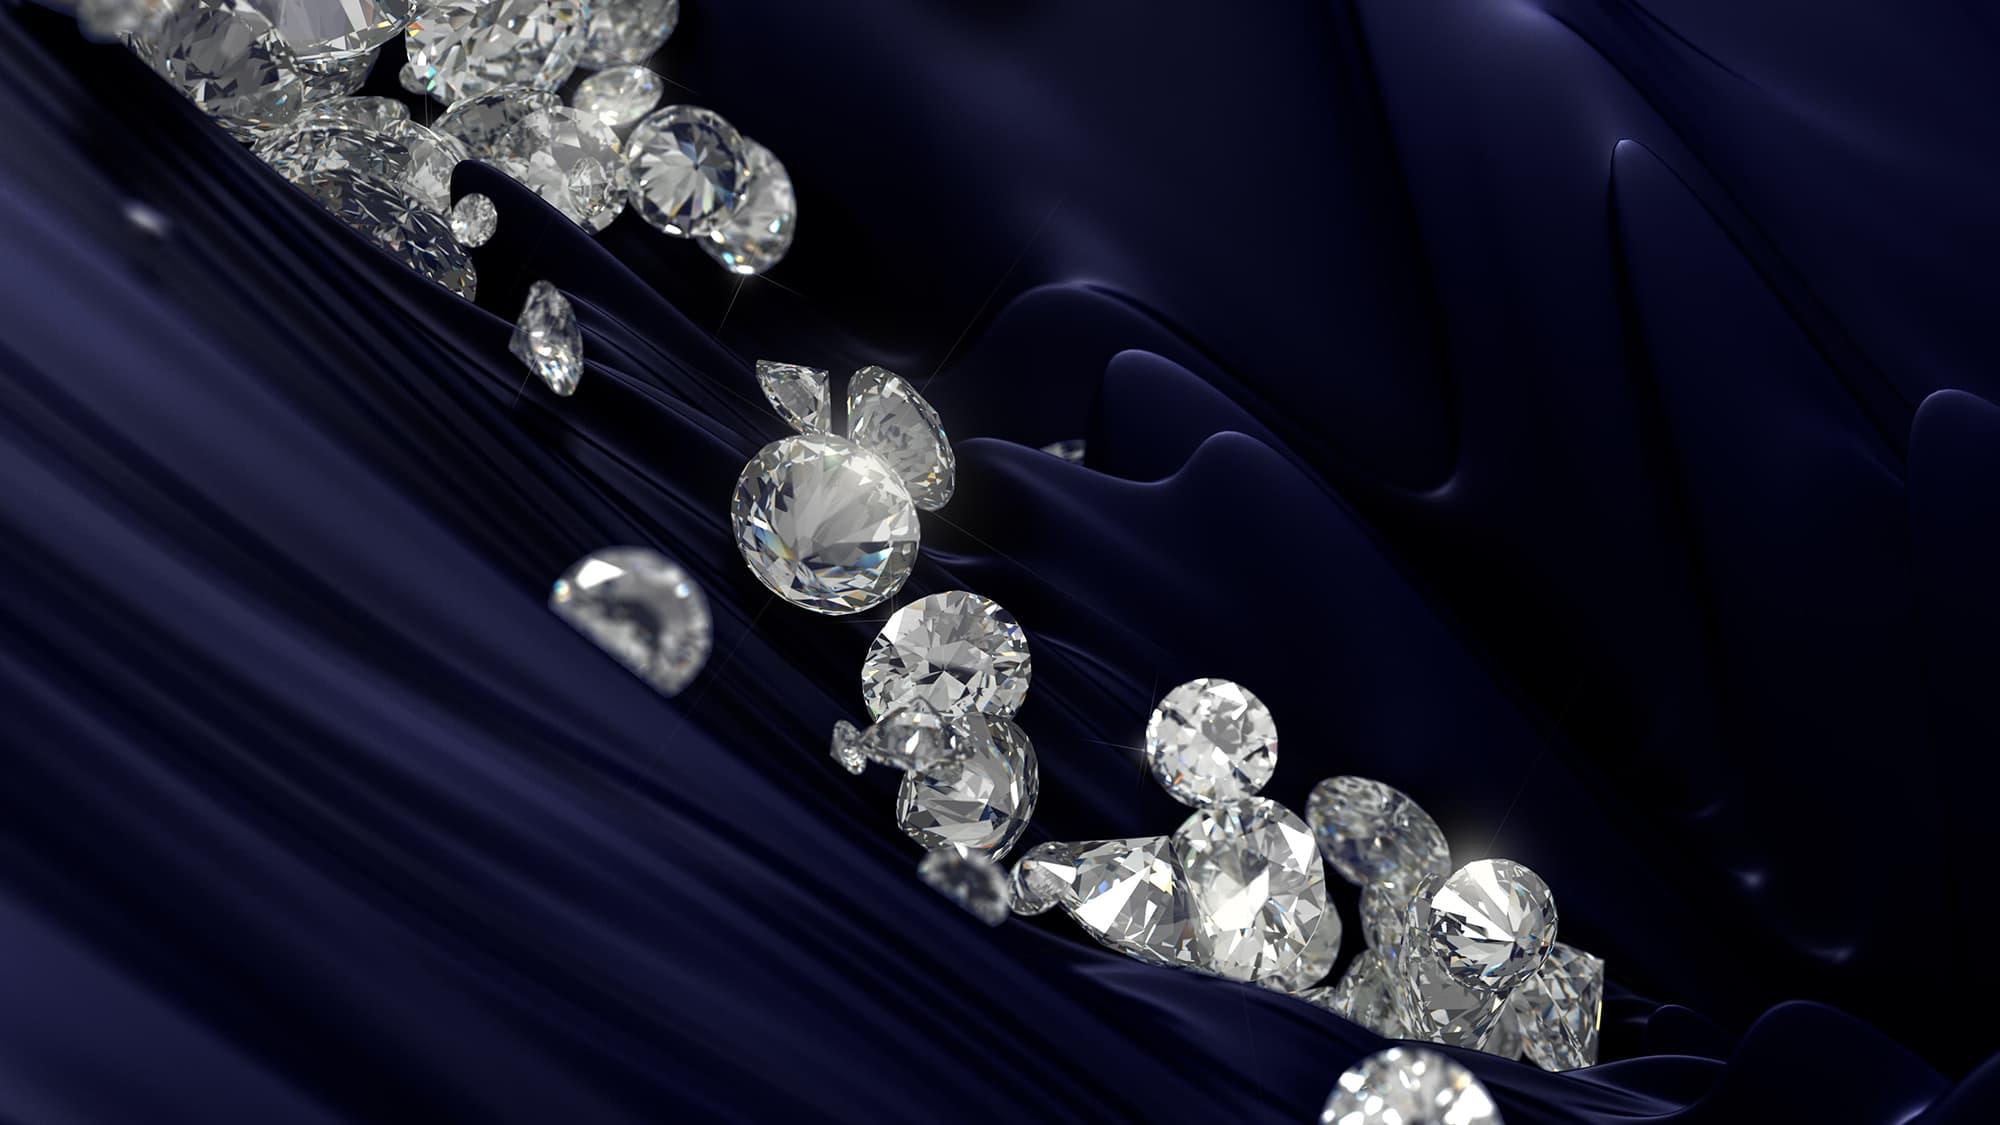 Lusix lab-grown diamonds. White diamonds falling on blue texture.